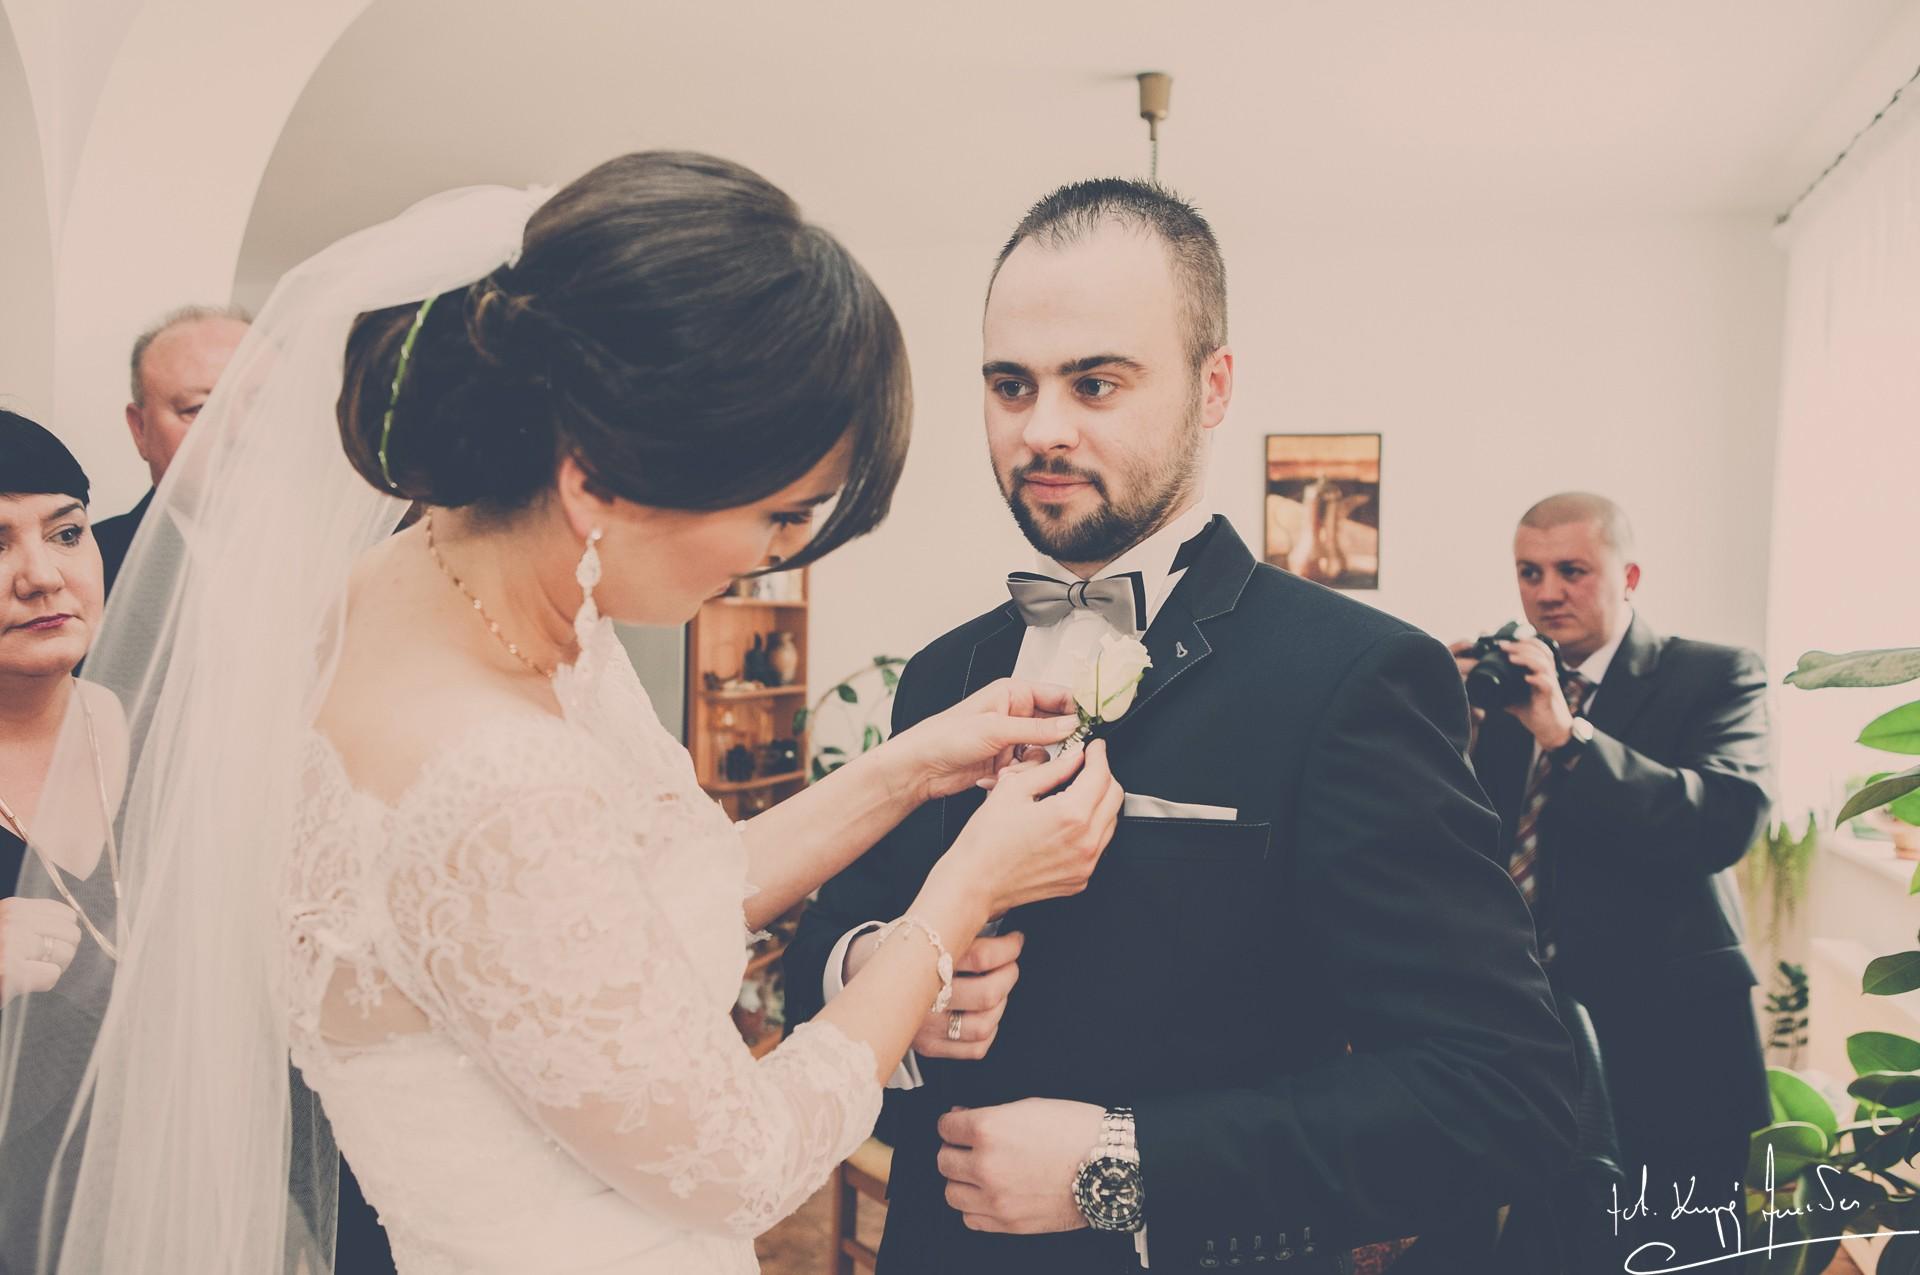 fotograf slubny szklarska poreba 23 Alicja & Tomasz